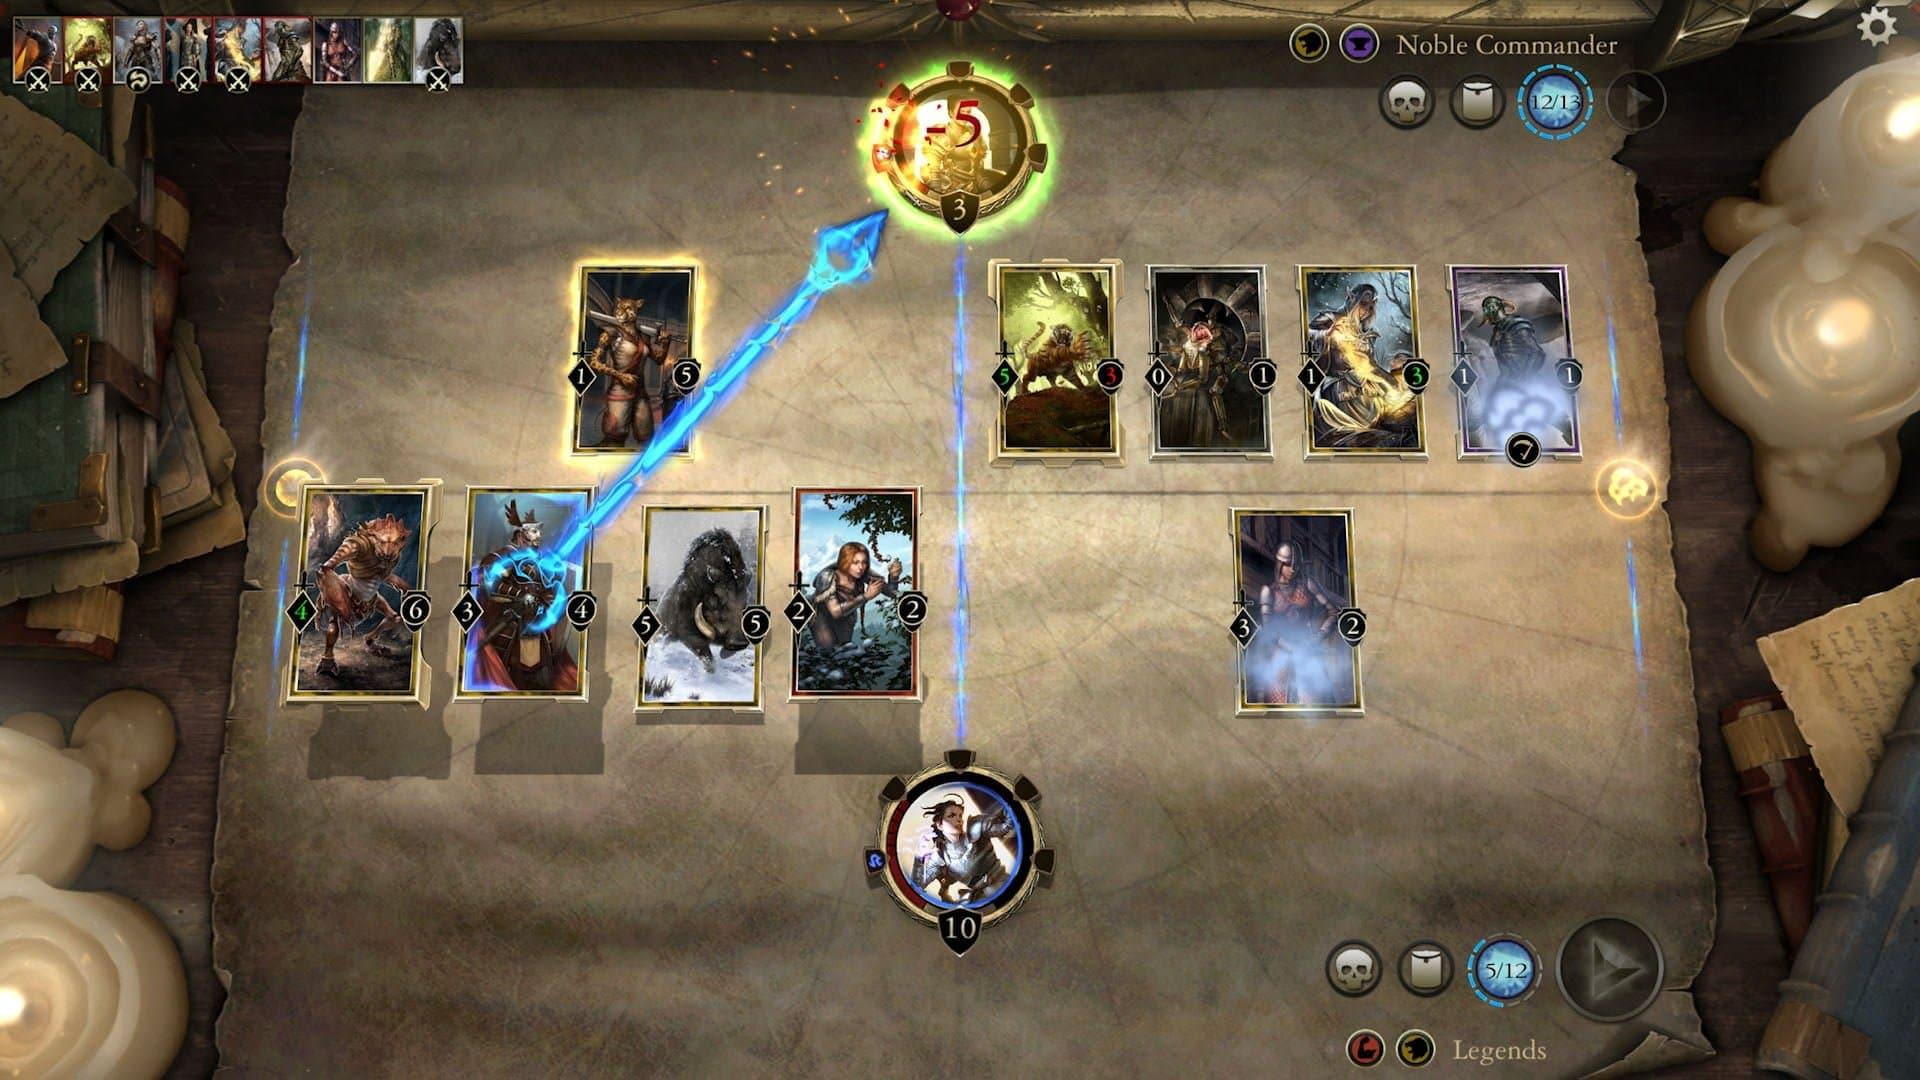 Decargar The Elder Scrolls: Legends - Héroes de Skyrim para Android